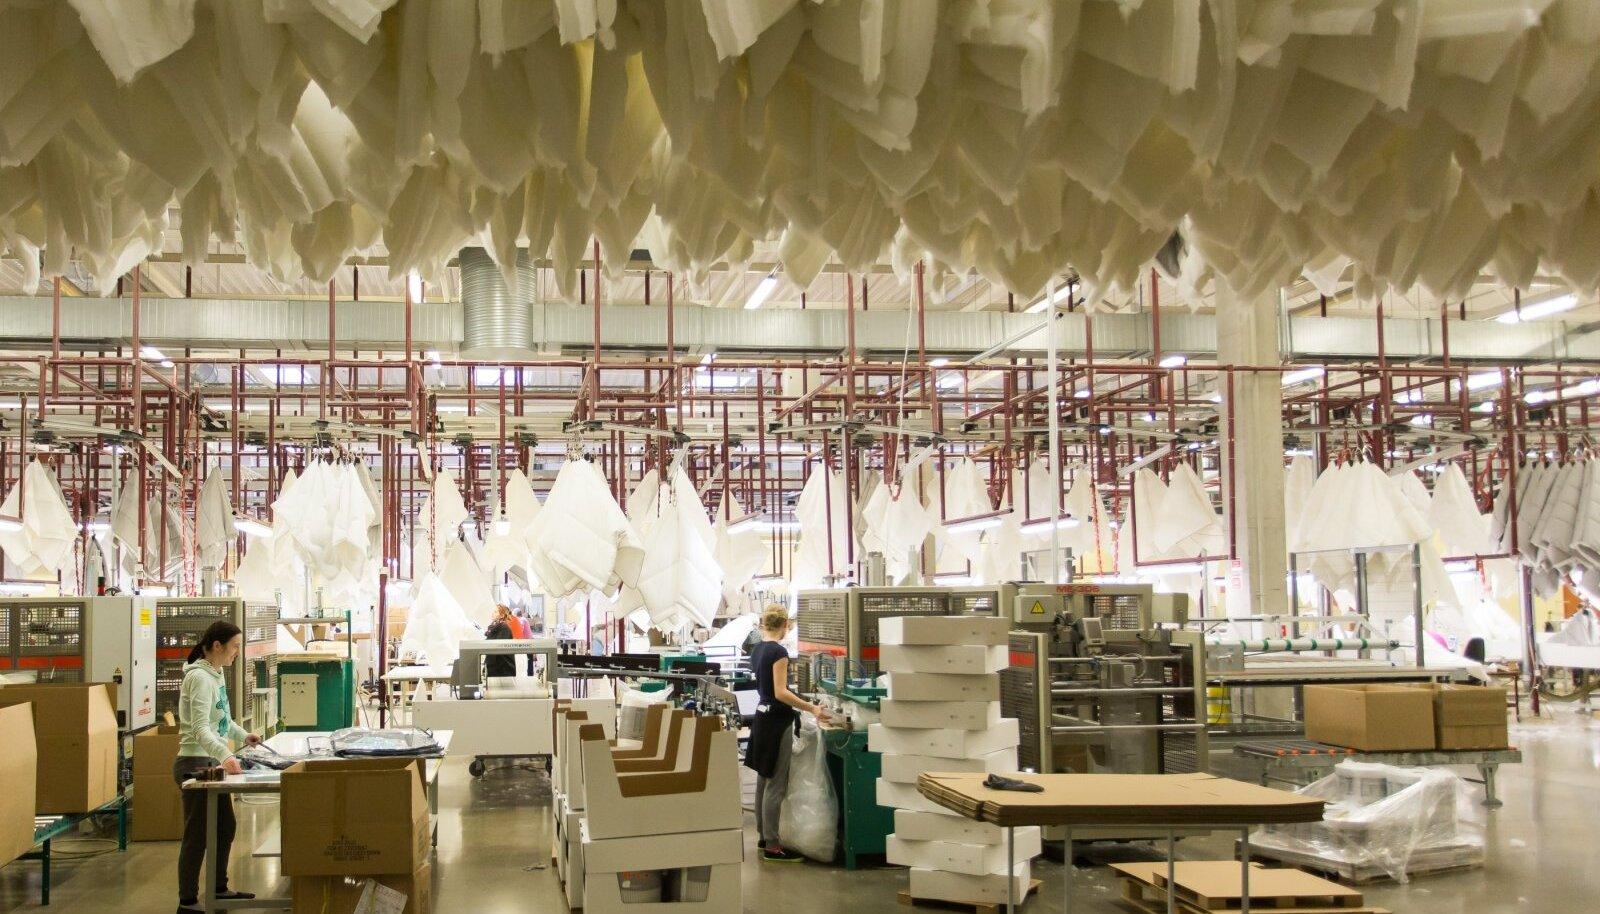 Wendre tehas